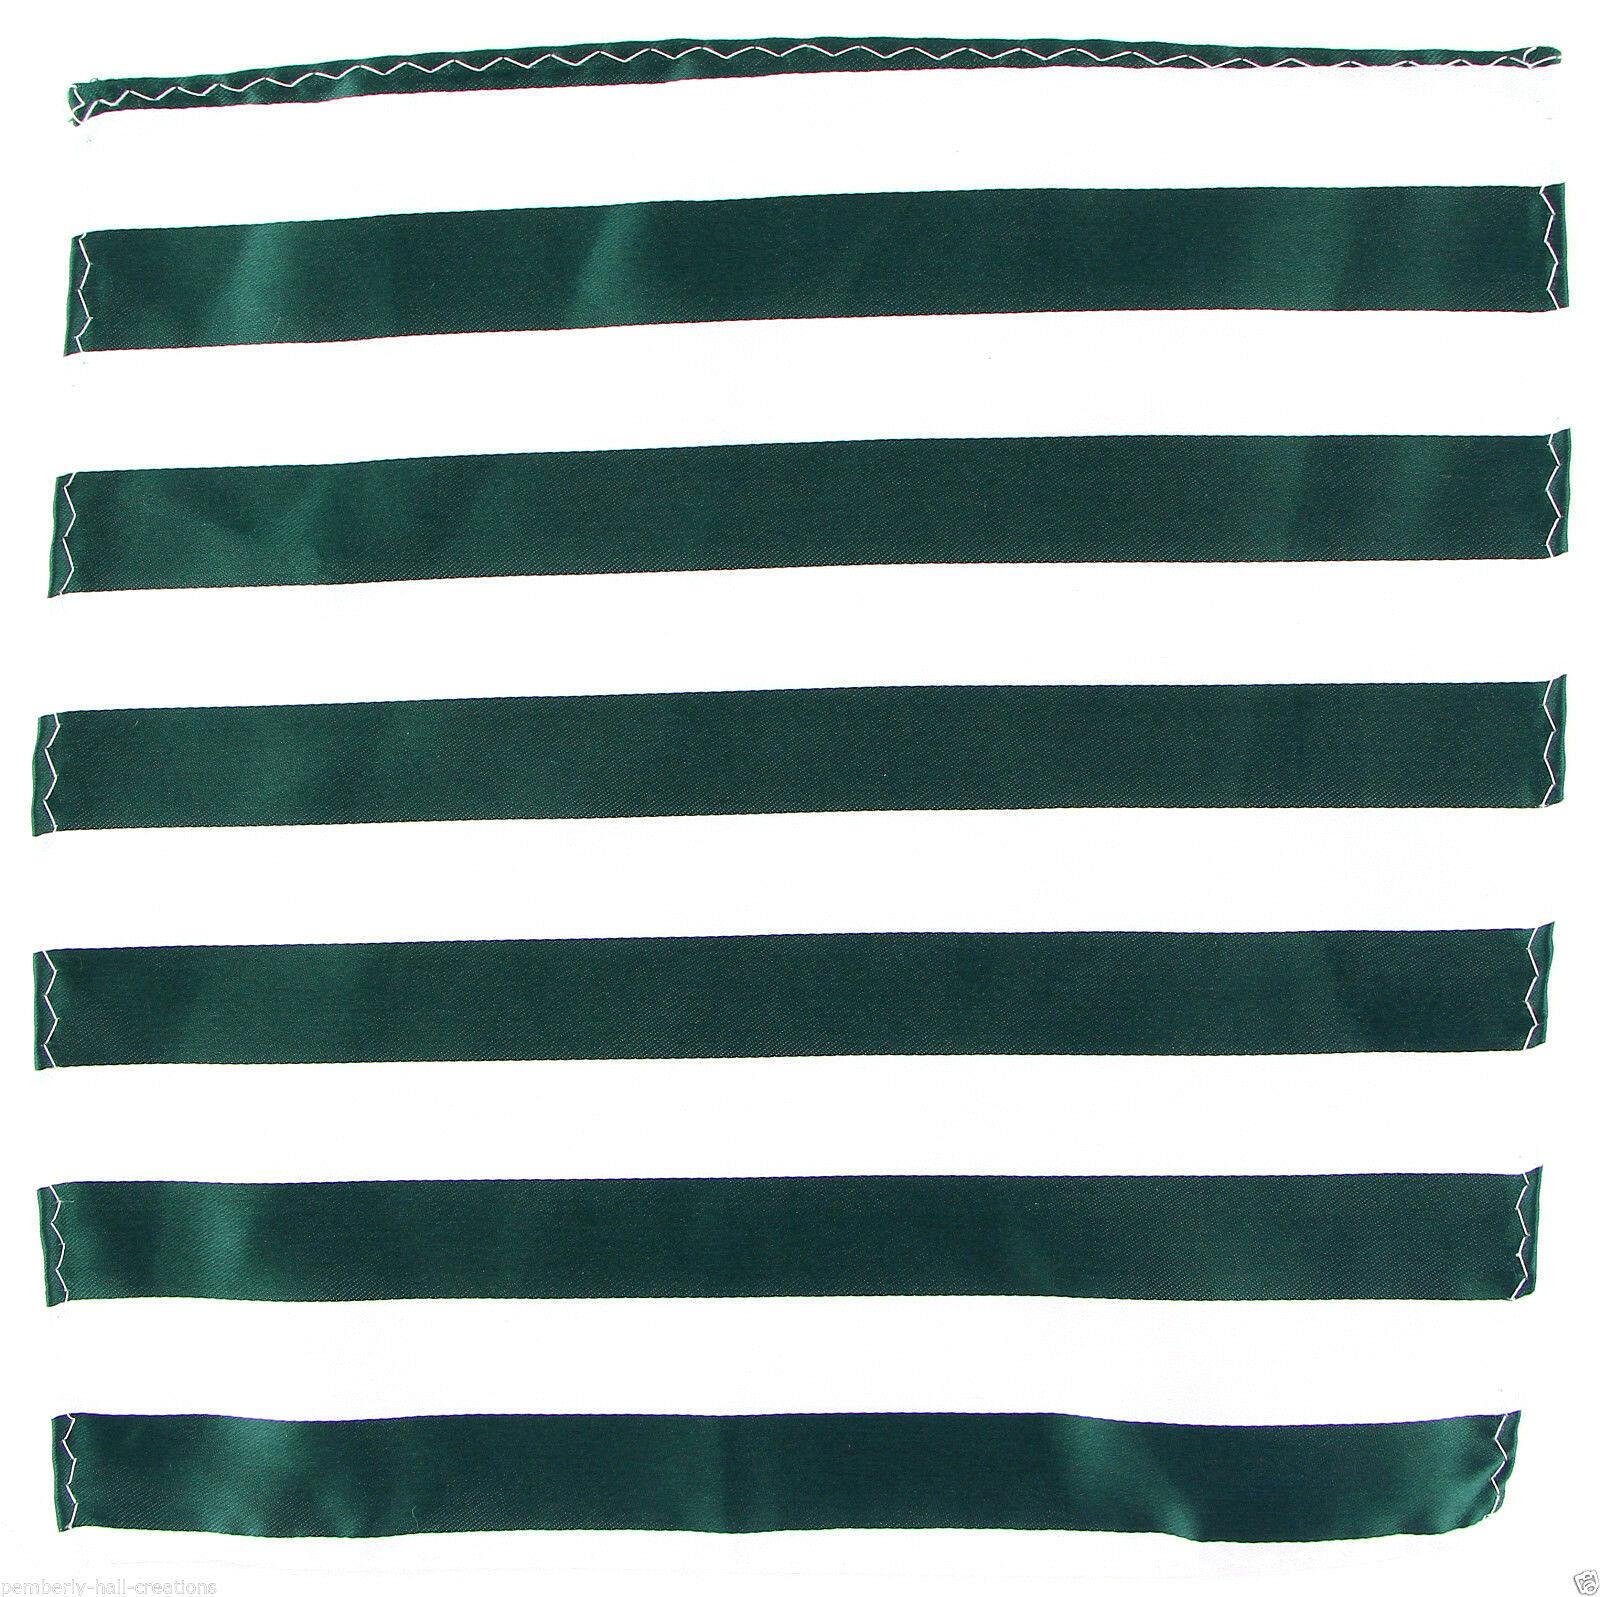 Men's Striped Pocket Square Fashion Handkerchief Dress Dark Green & White Hanky